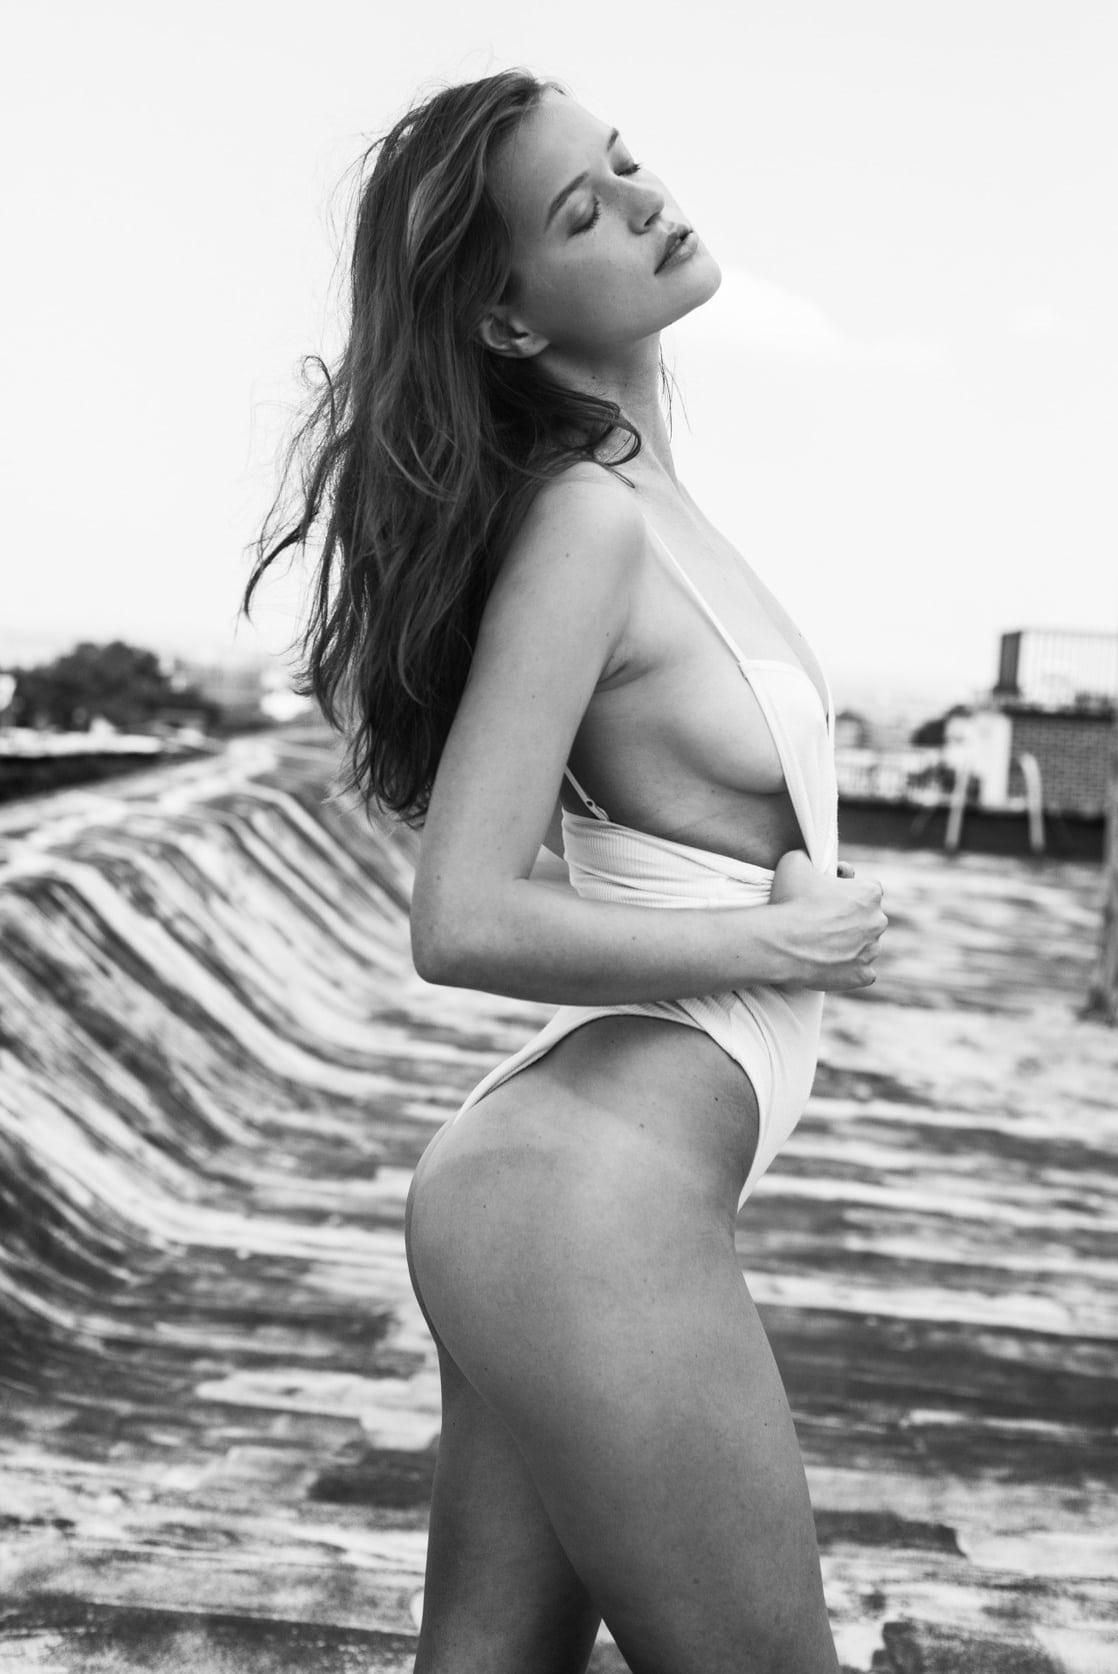 Hot nude korean girls photos